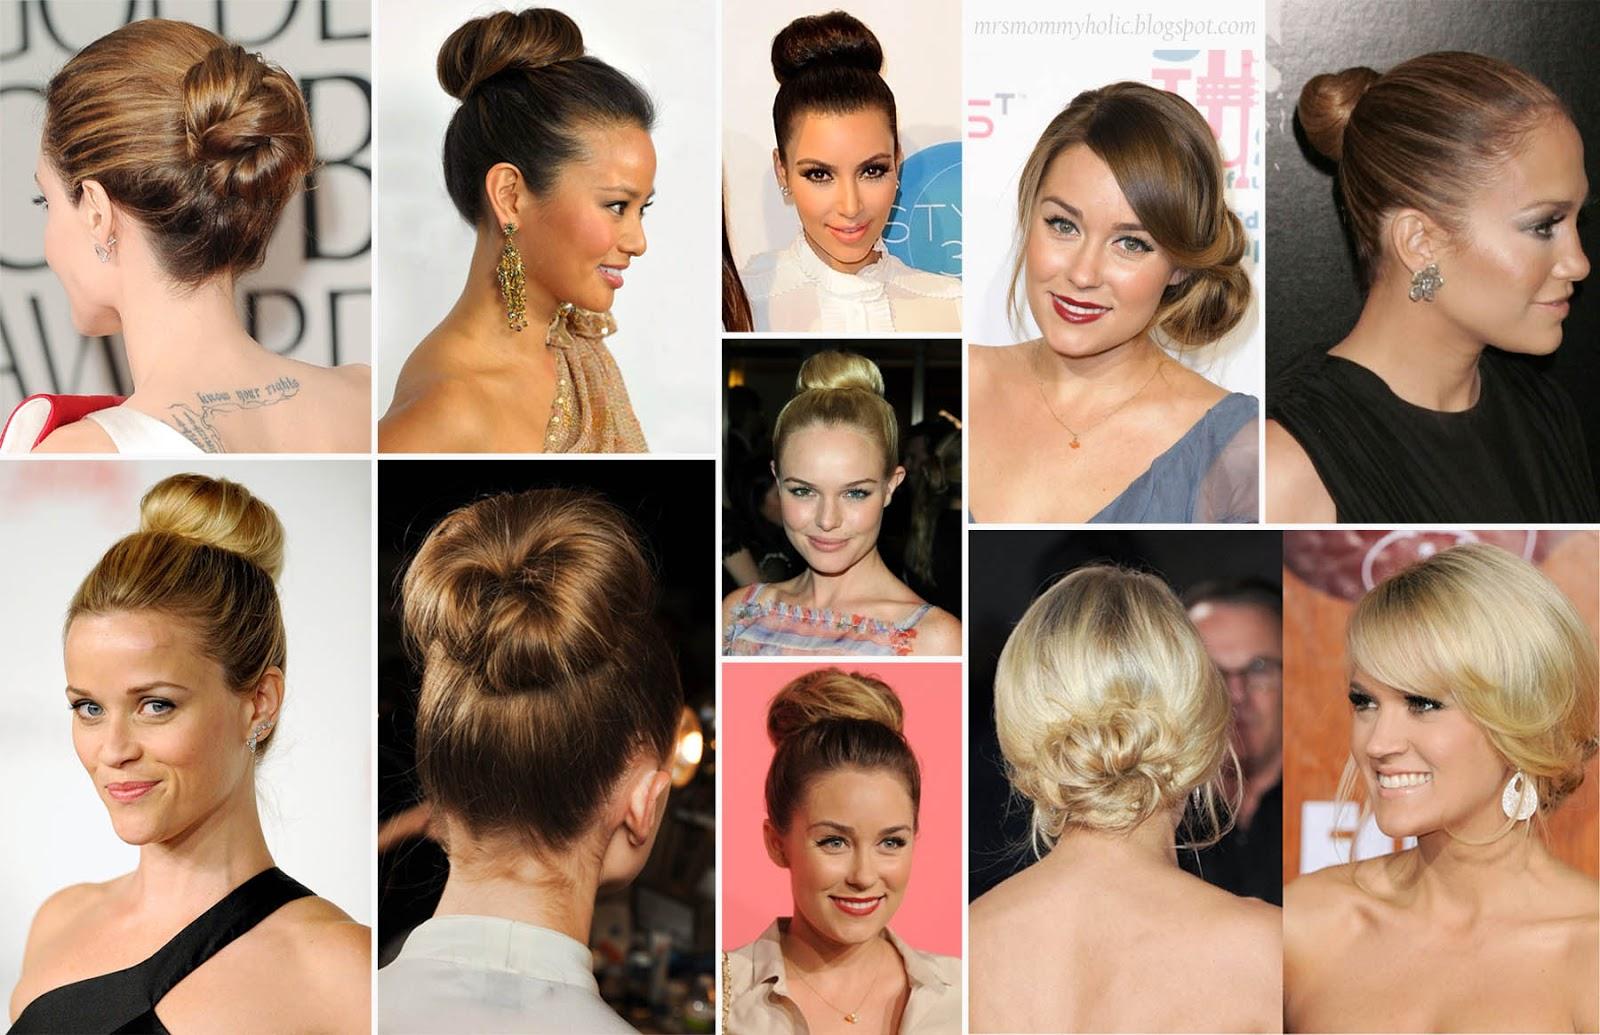 Mrsmommyholic Easiest Hairstyle Ever The Donut Bun